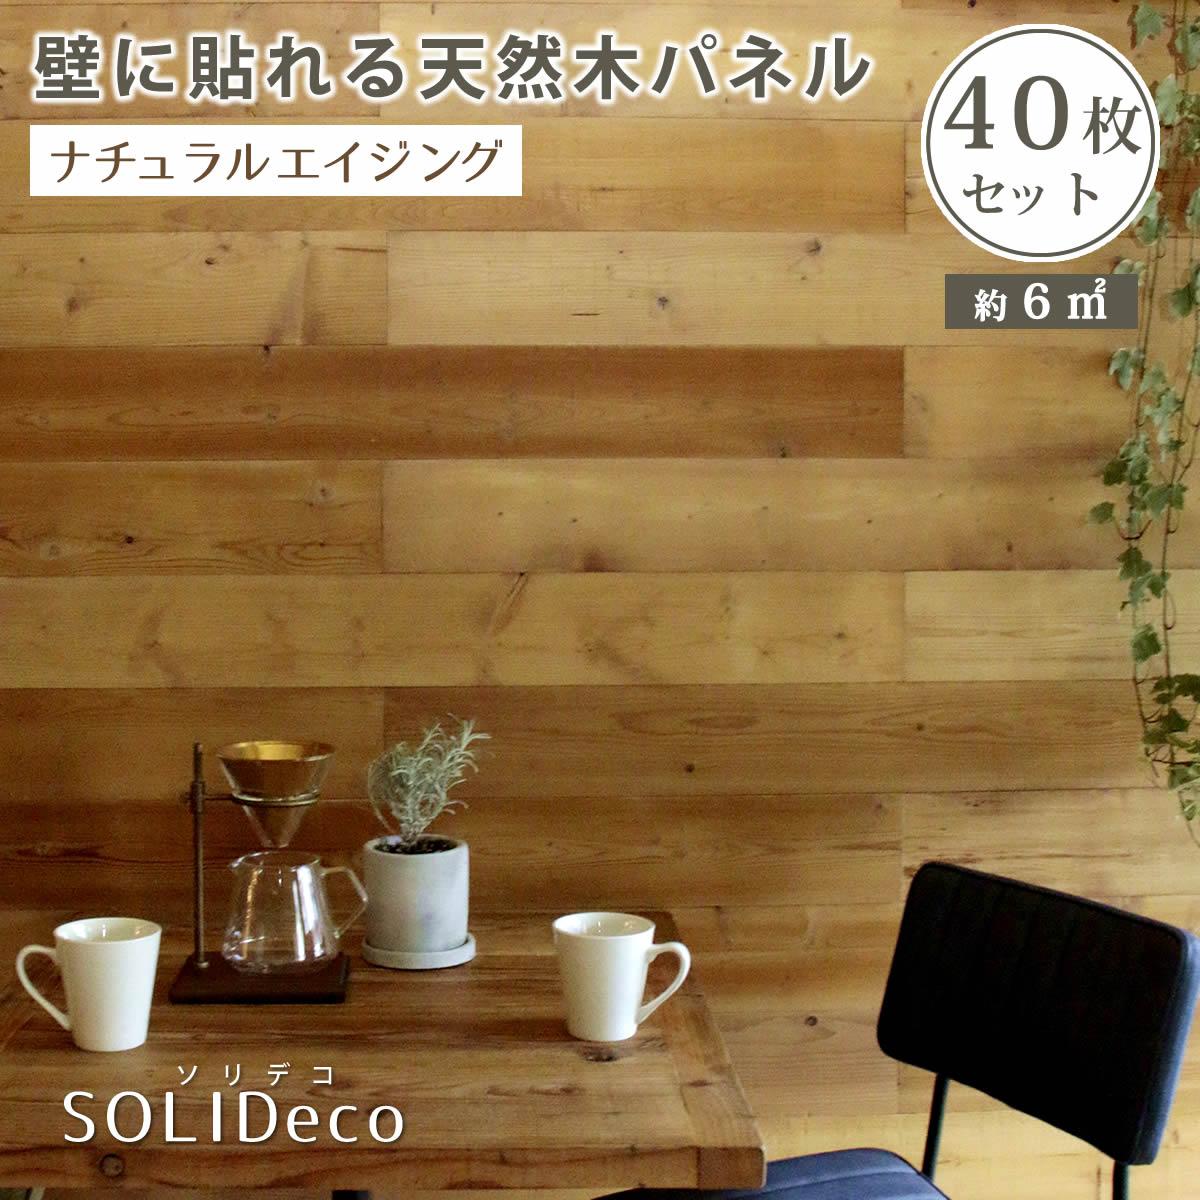 SOLIDECO 壁に貼れる天然木パネル ナチュラルシリーズ (ナチュラルエイジング) 40枚組 (約6m2) 壁紙 装飾フィルム 壁紙SLDC-40P-002AGE 壁パネル ウォールパネル ウッドパネル DIY 壁紙